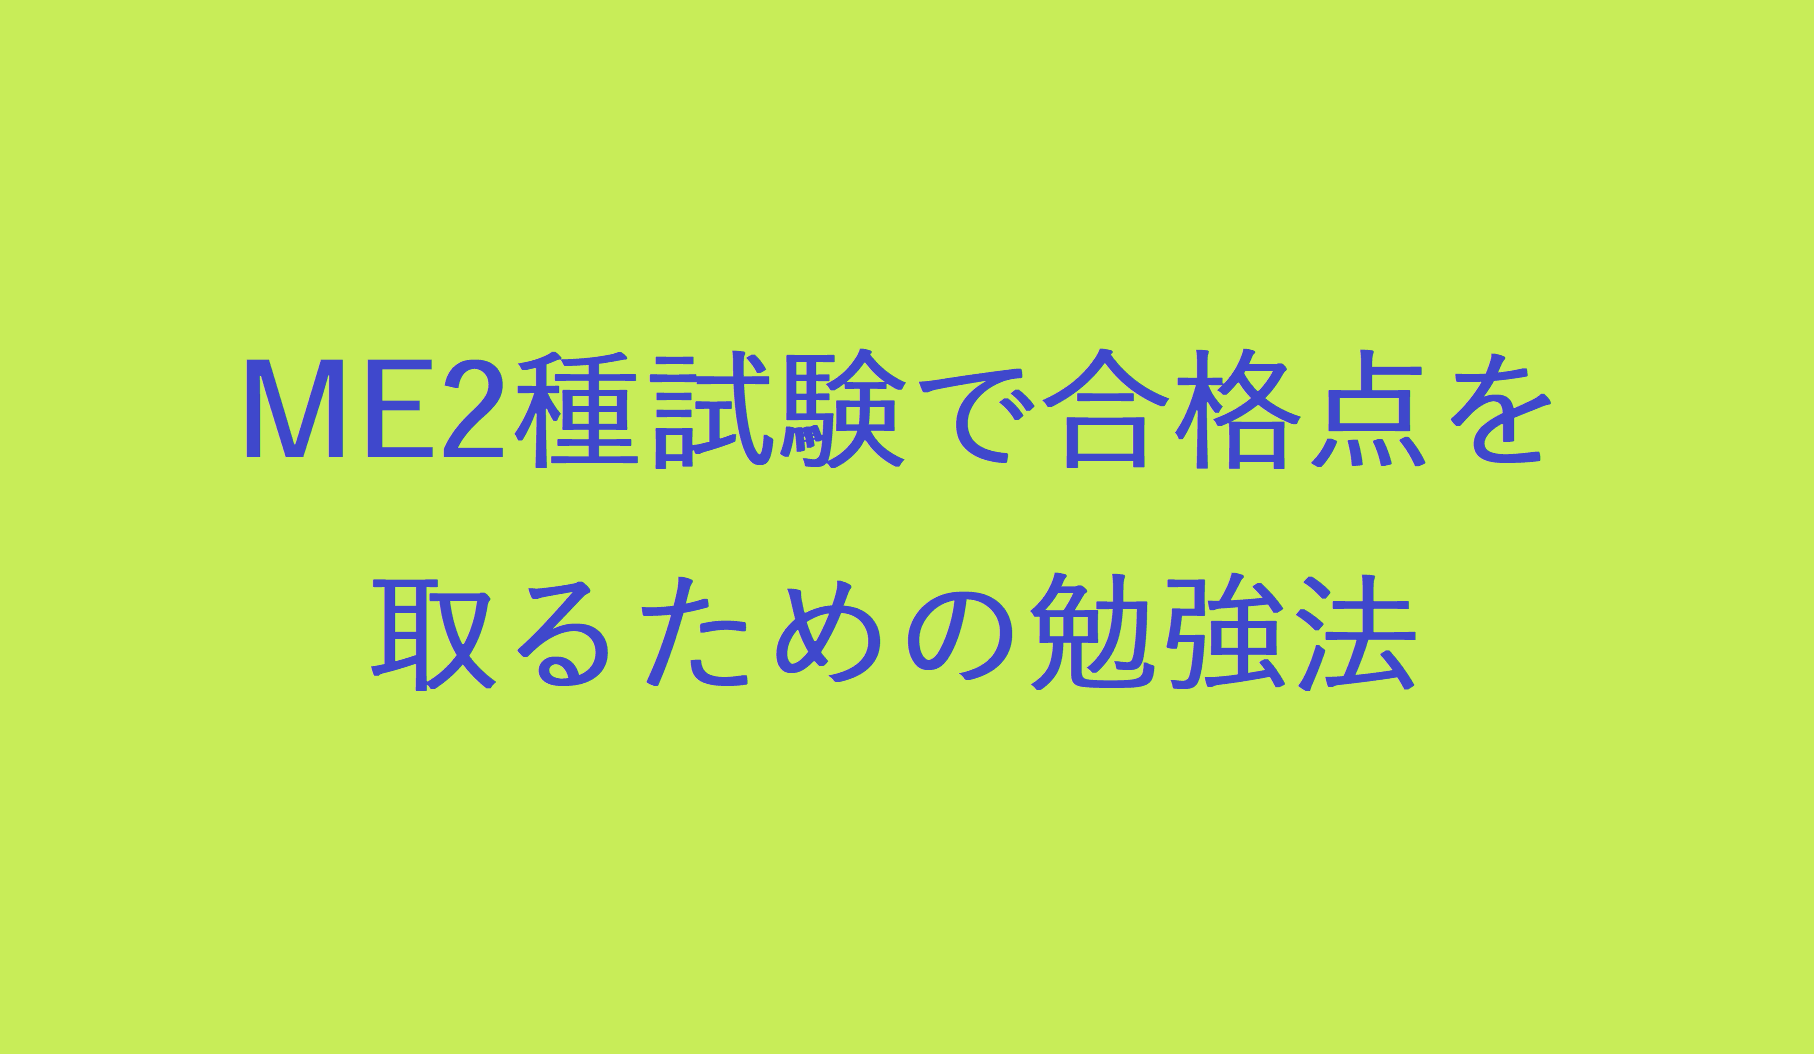 me2 種 33 回 解答